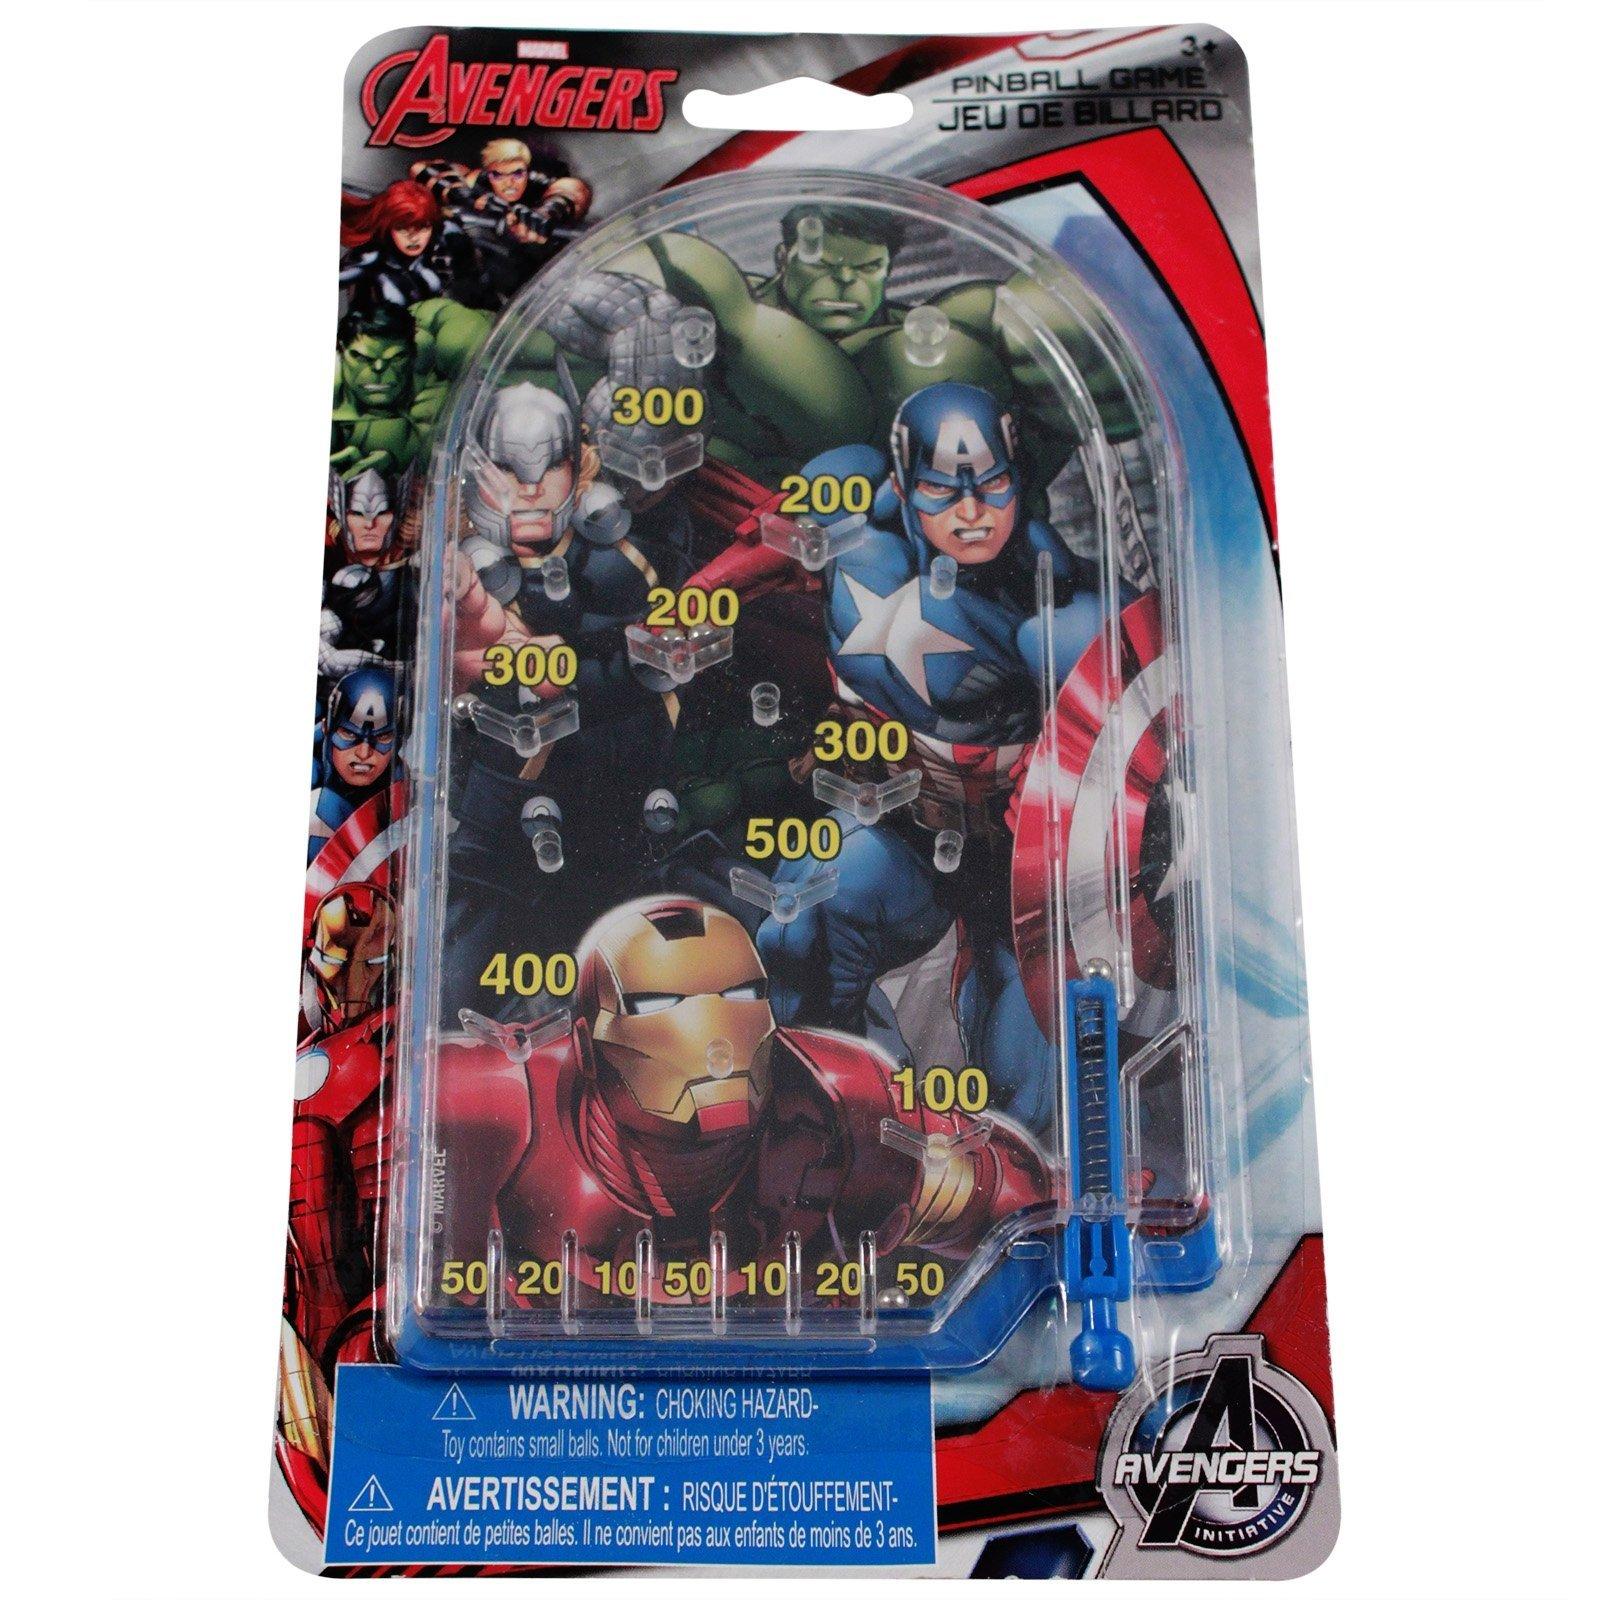 Marvel Avengers Miniature Handheld Pinball Game Boys Themed Birthday Party Favors